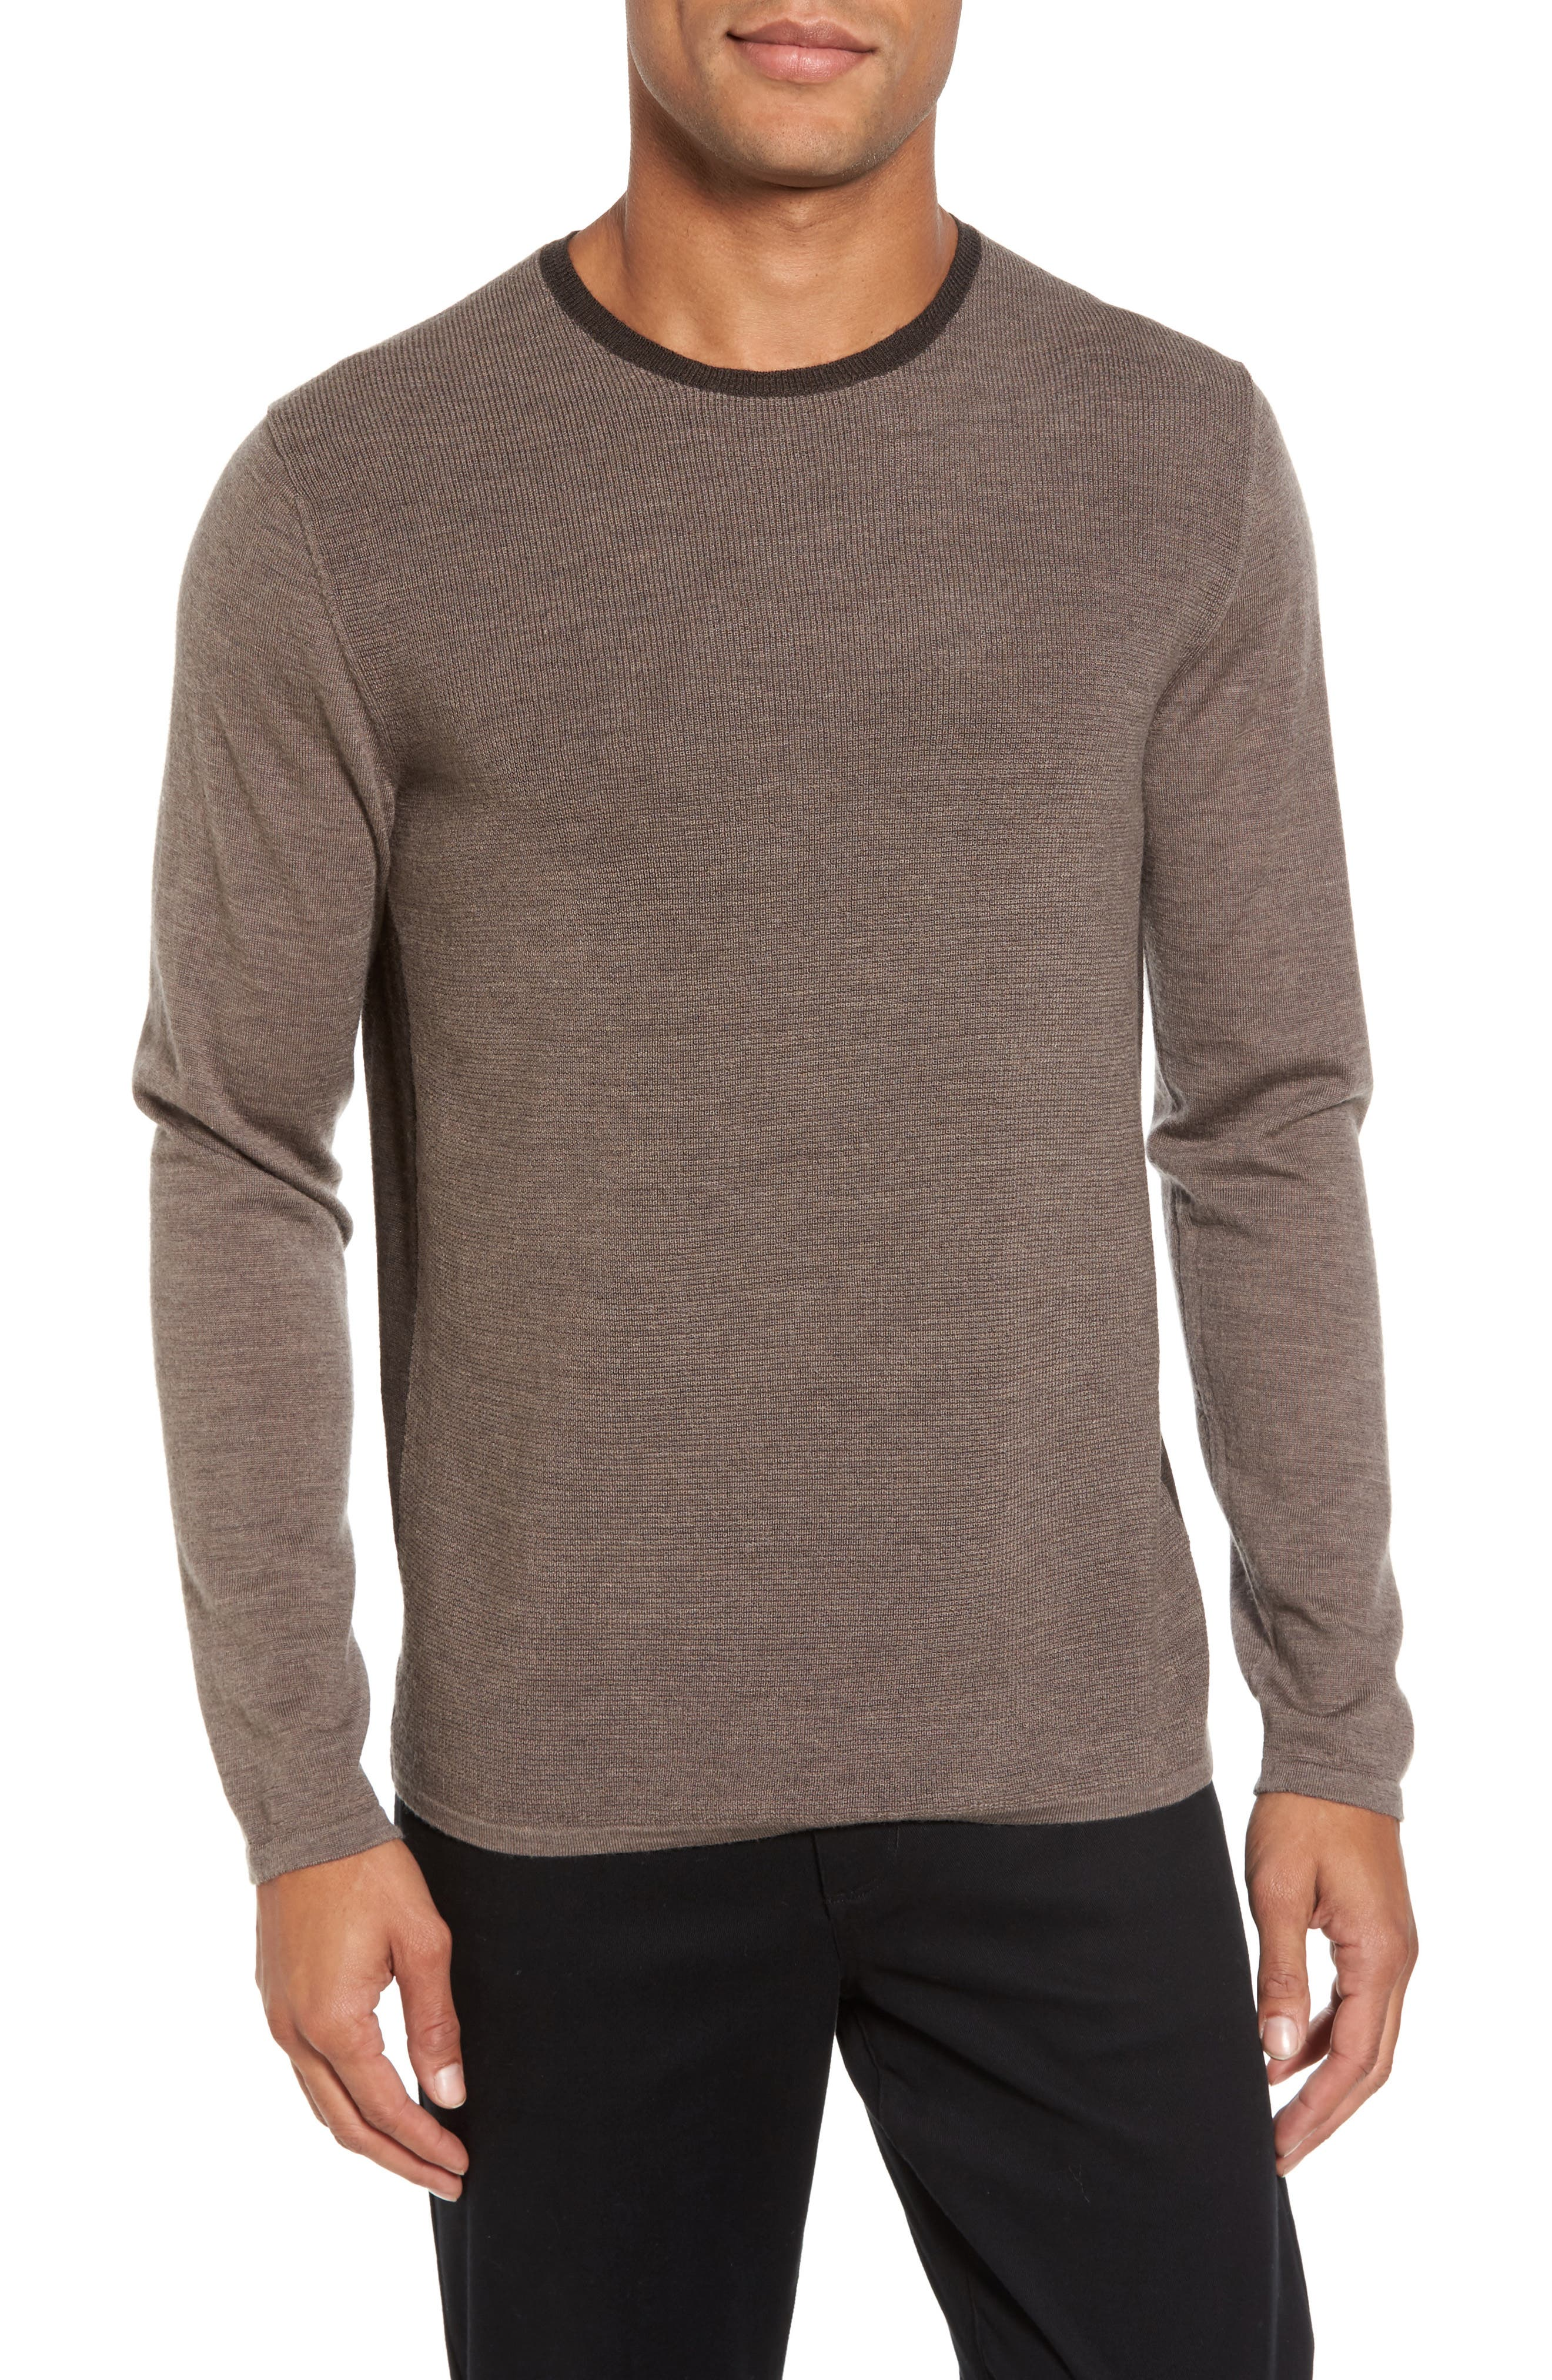 Huxley Merino Sweater,                             Main thumbnail 1, color,                             LIGHT COFFEE